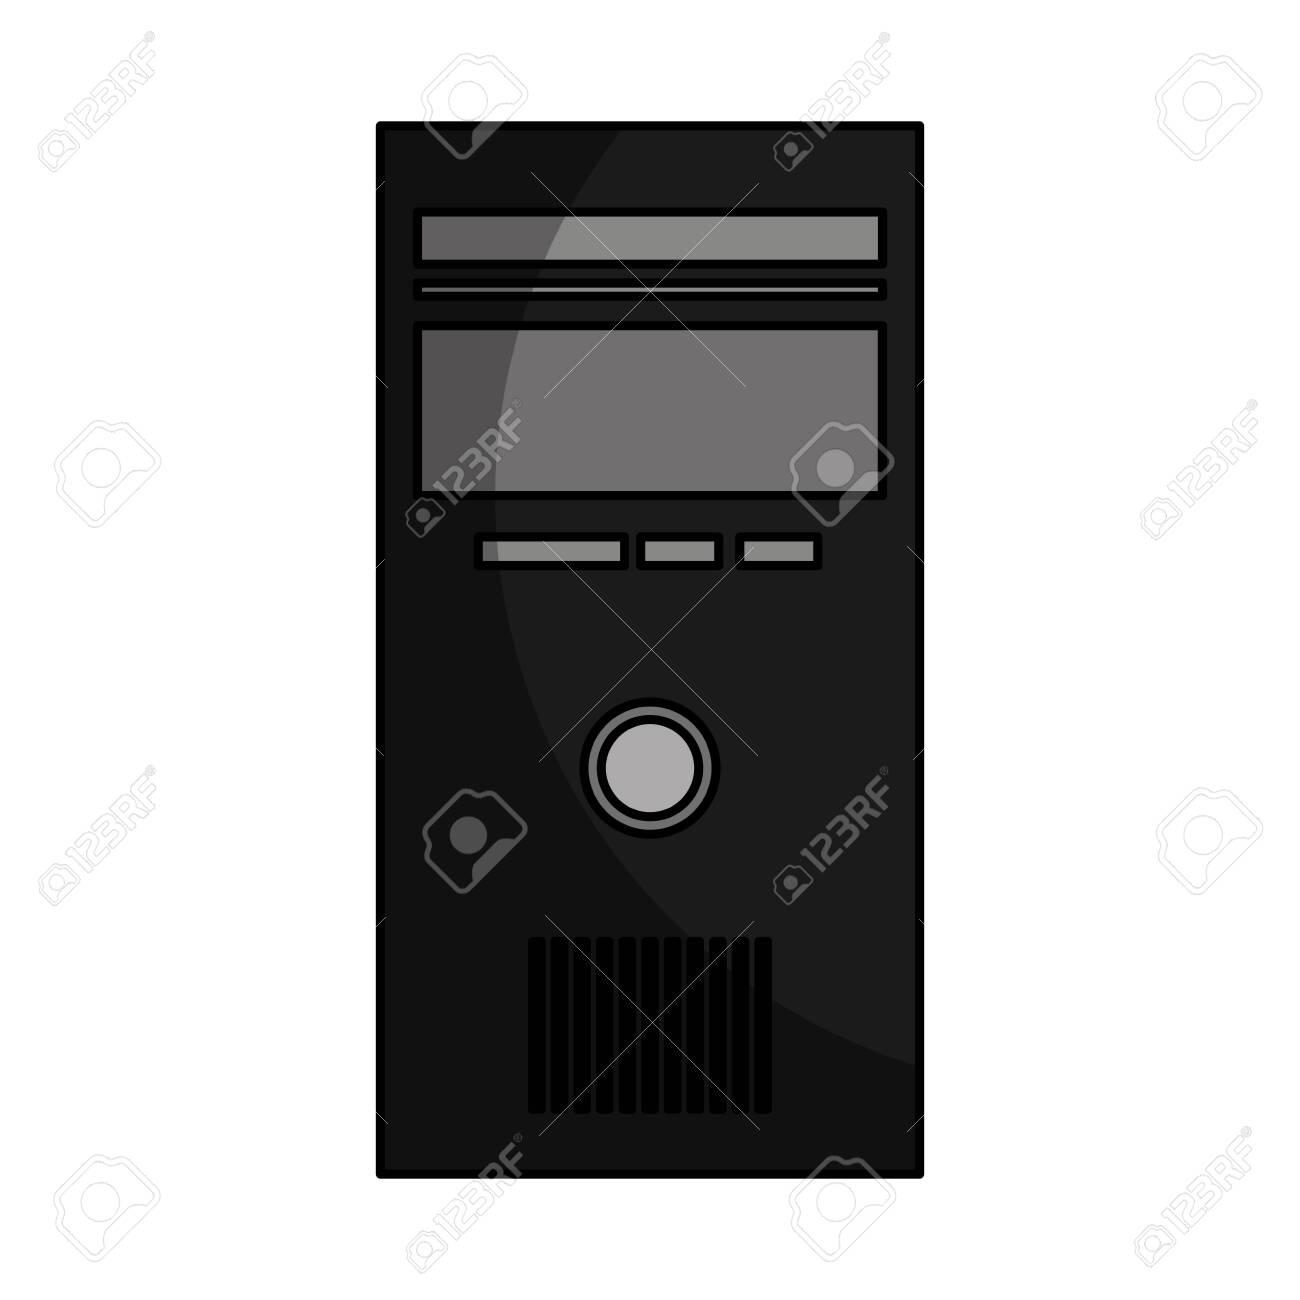 computer desktop cpu isolated icon vector illustration design - 124202197